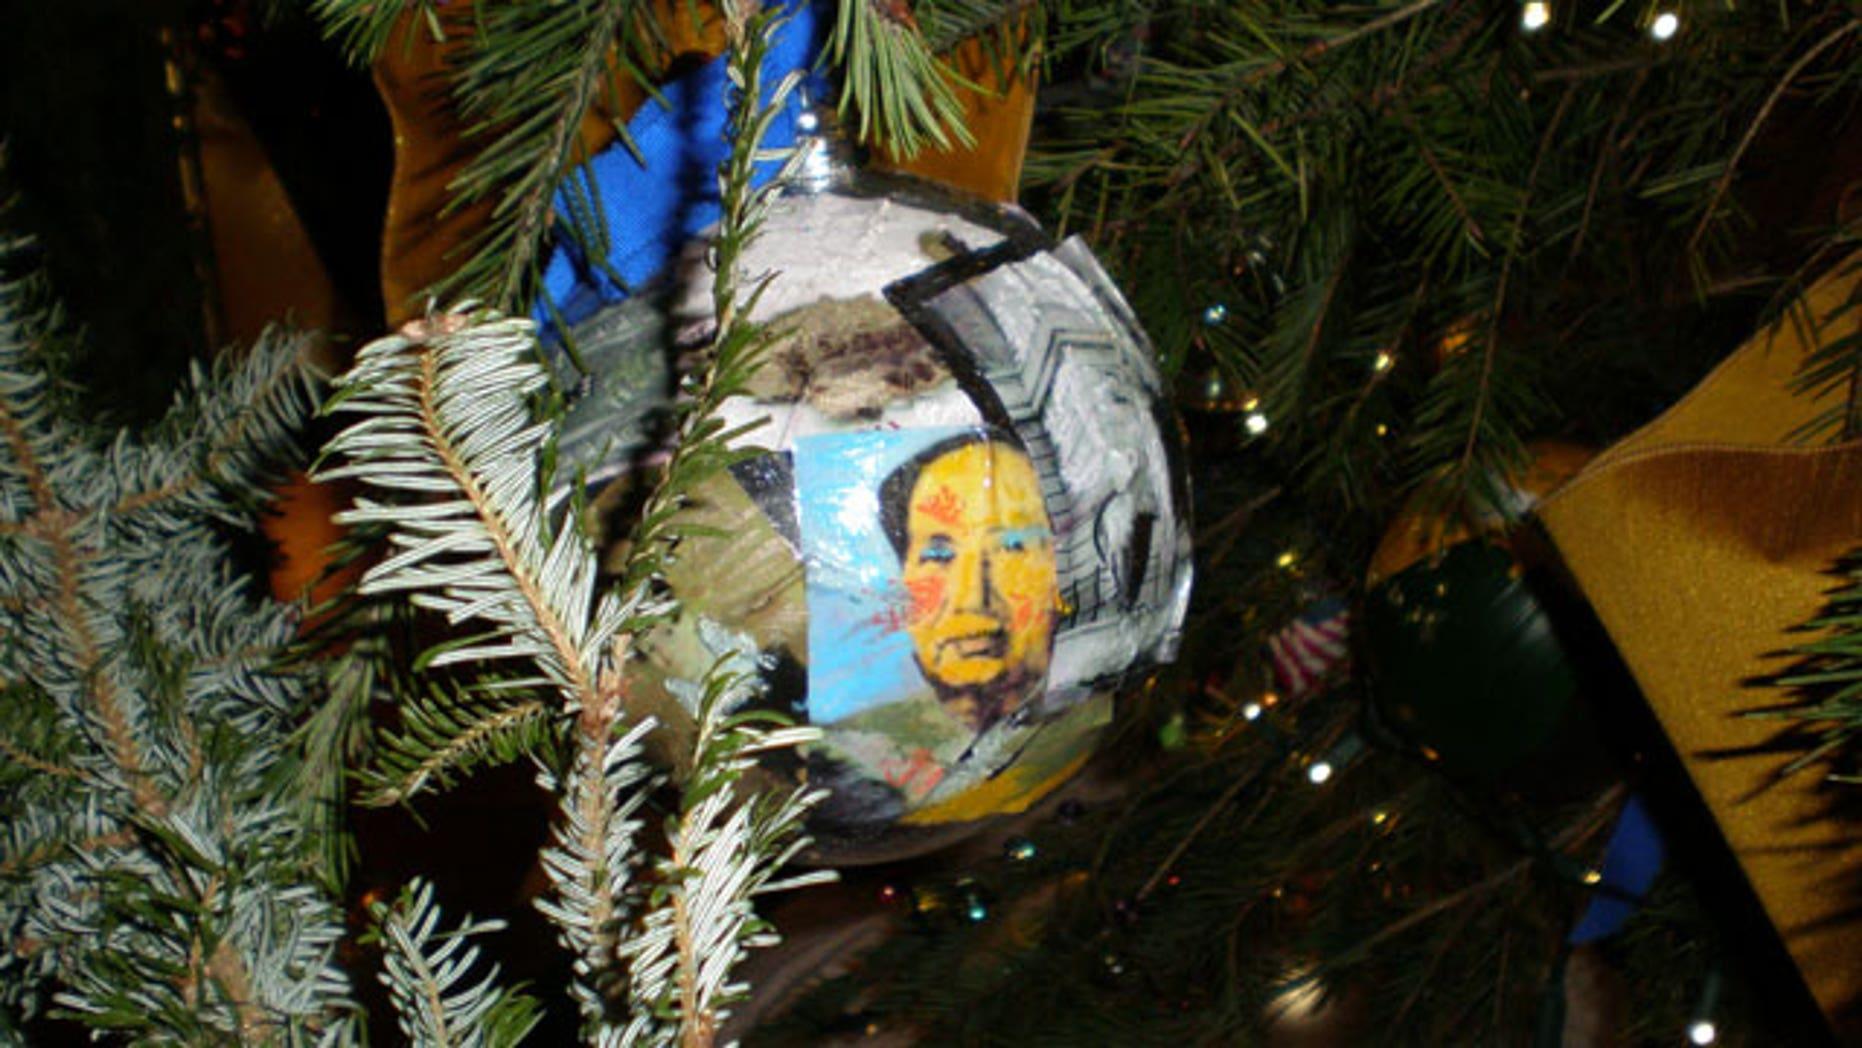 Barack Obama Christmas Tree Ornament